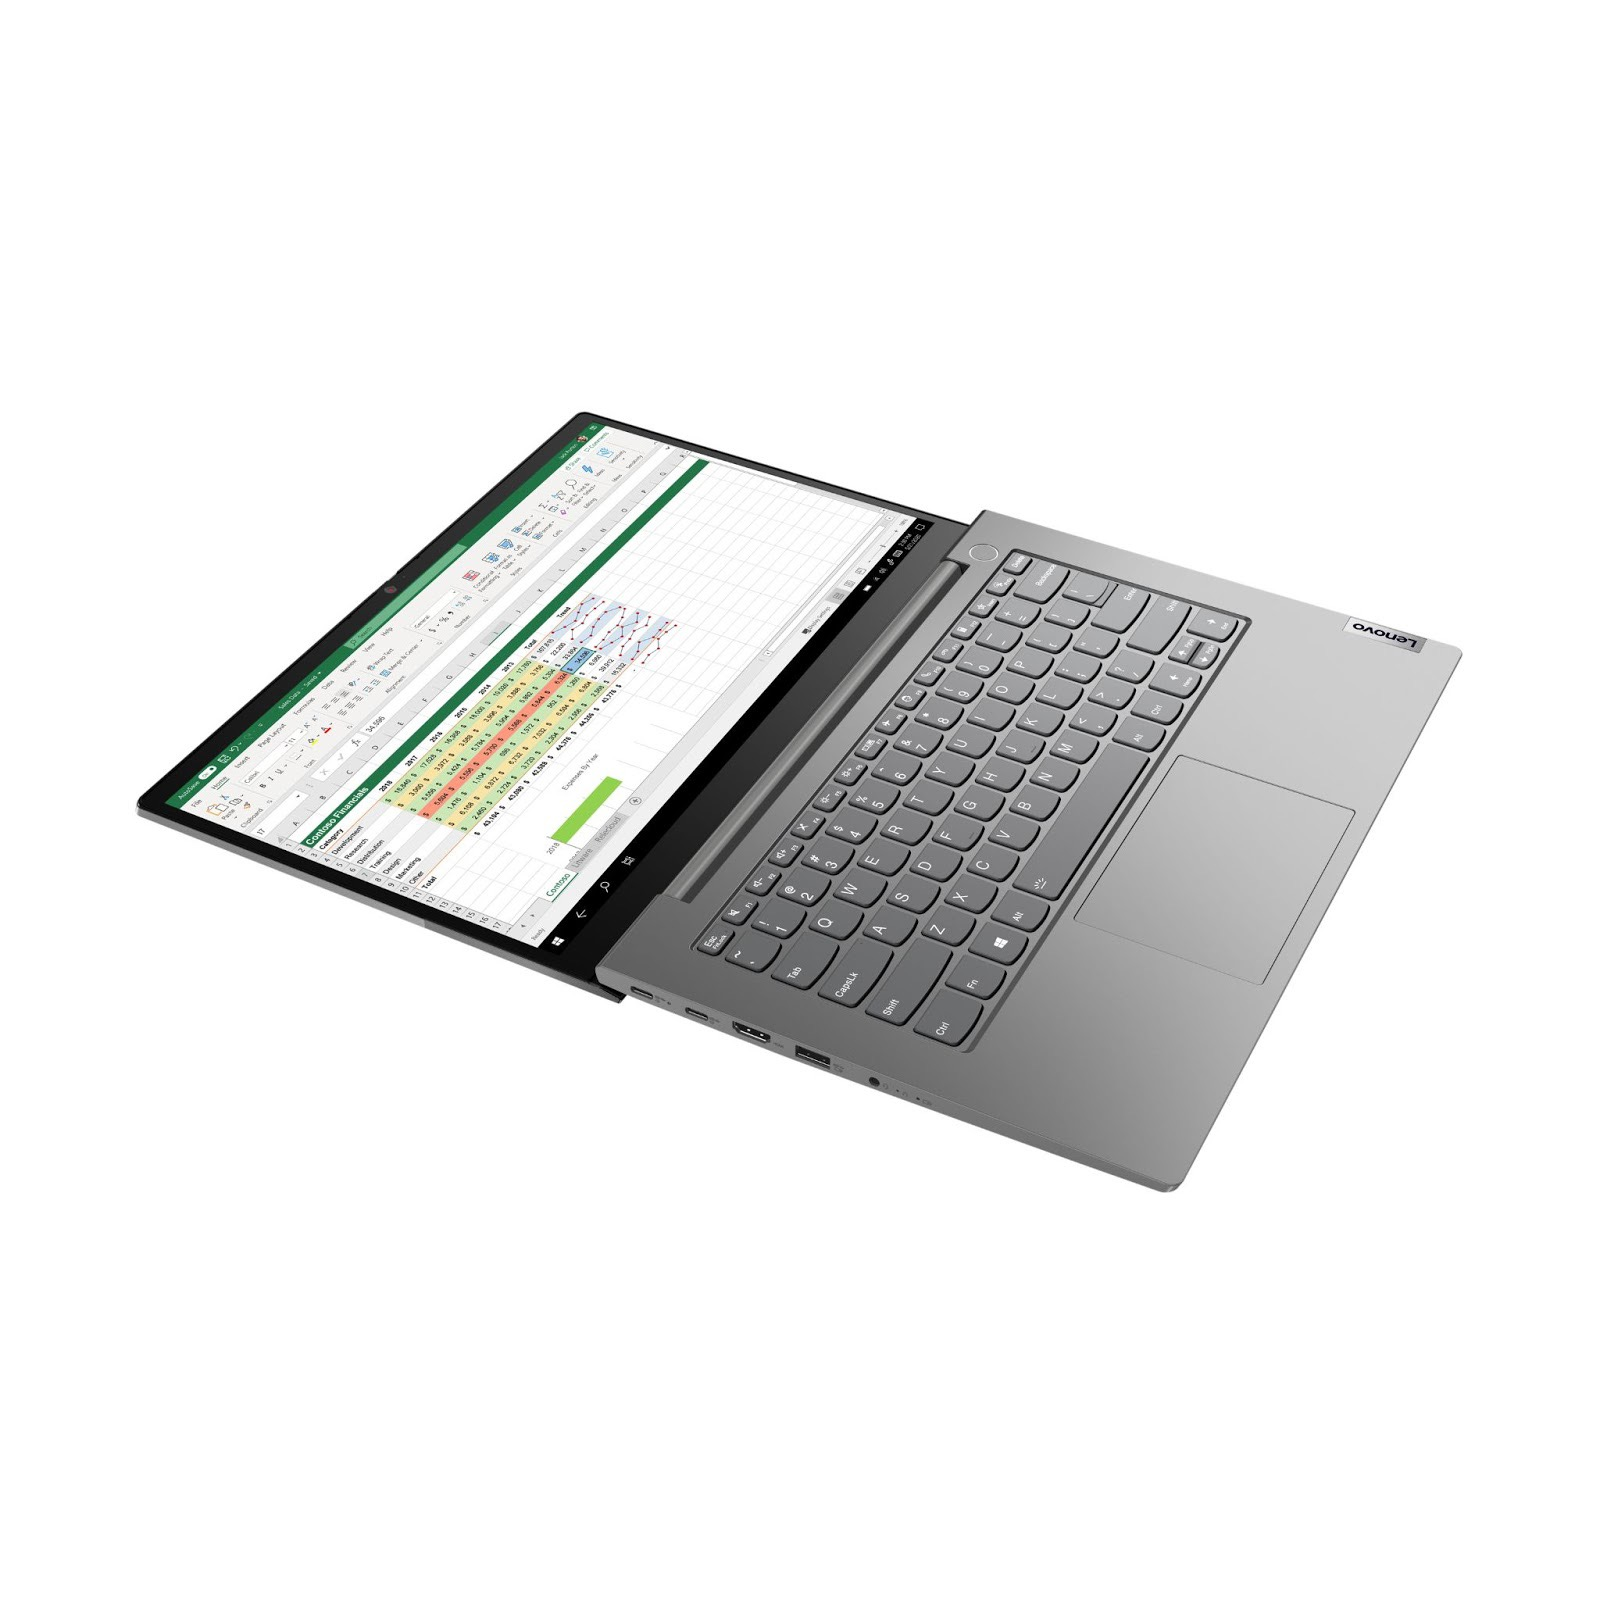 Фото 3. Ноутбук Lenovo ThinkBook 14 Gen 2 ITL Mineral Grey (20VD006CRU)